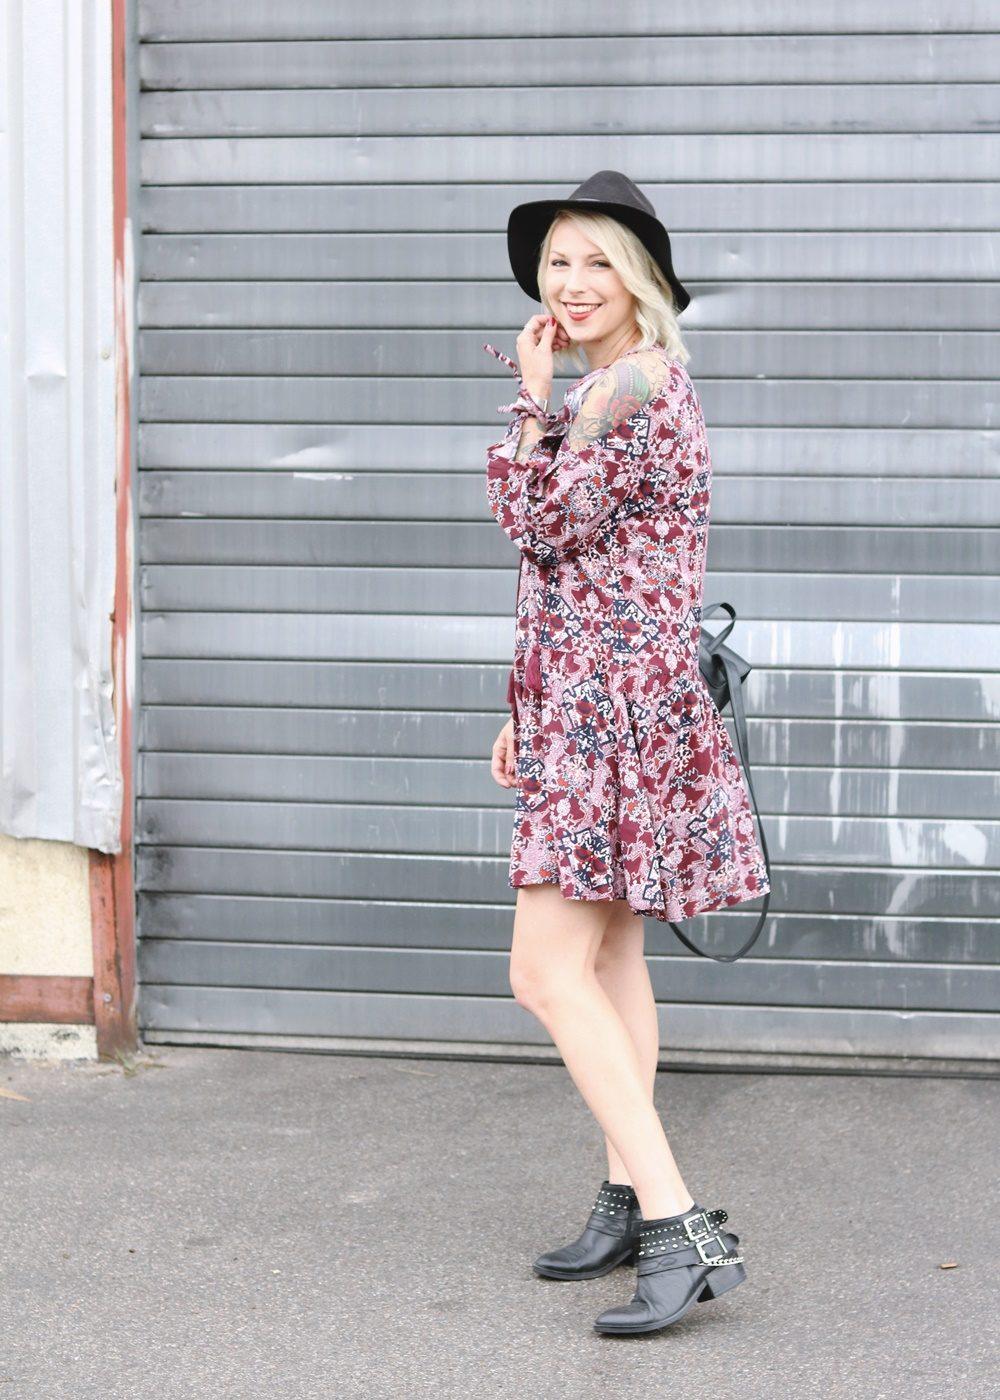 Fashionblogger Outfit Boho Kleid weinrot Bikerboots Rucksack Hut Ethno (4)